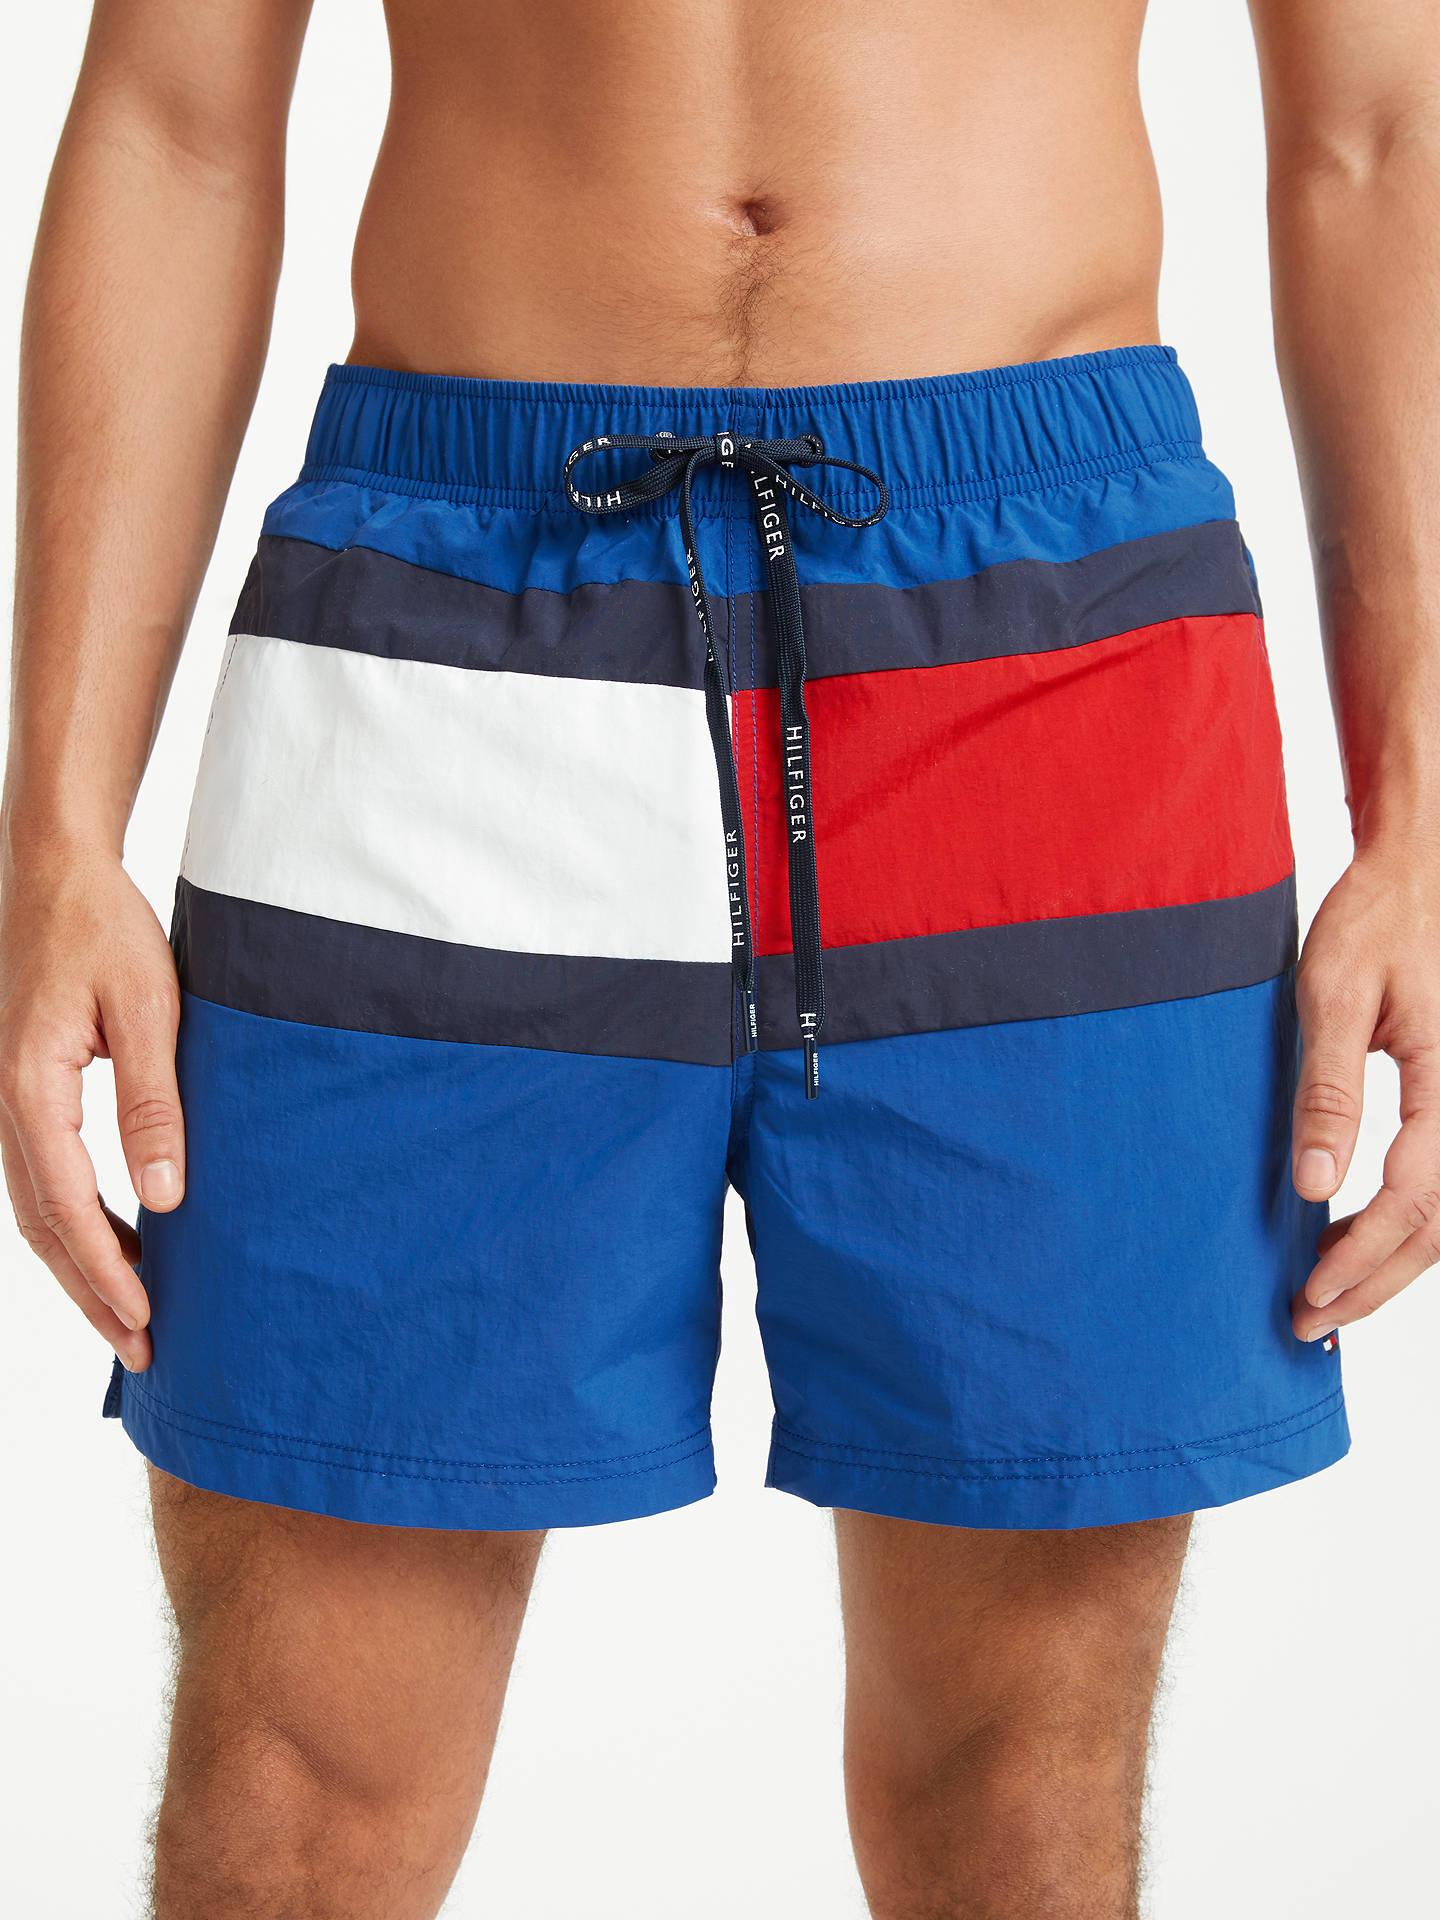 6841d04b4621b Buy Tommy Hilfiger Flag Design Swim Shorts, True Blue, XL Online at  johnlewis.